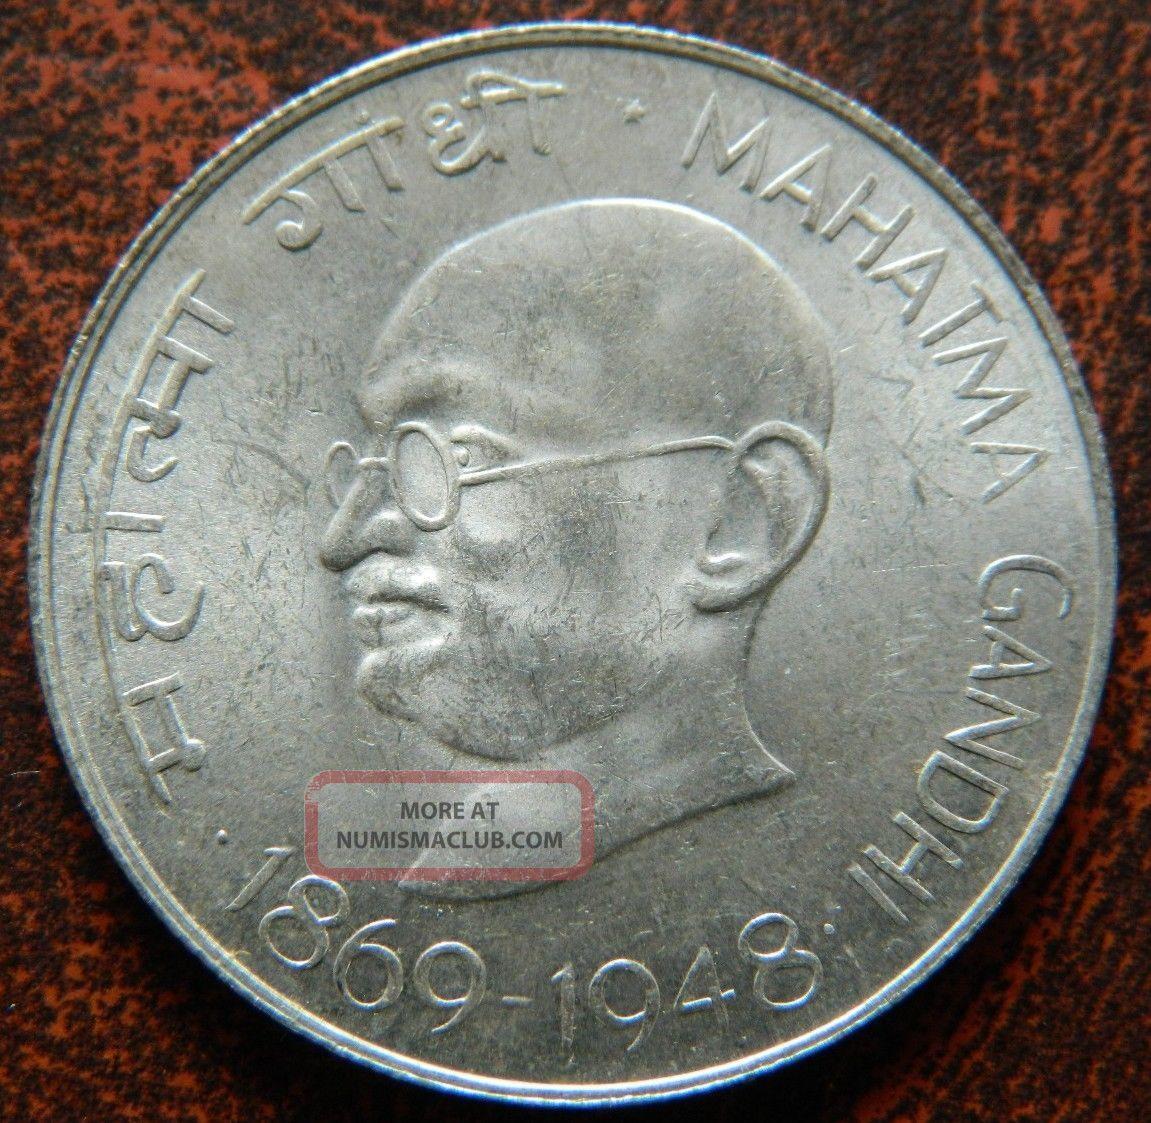 Mahatma Gandhi 10 Rupee Silver Coin Unc Luster India